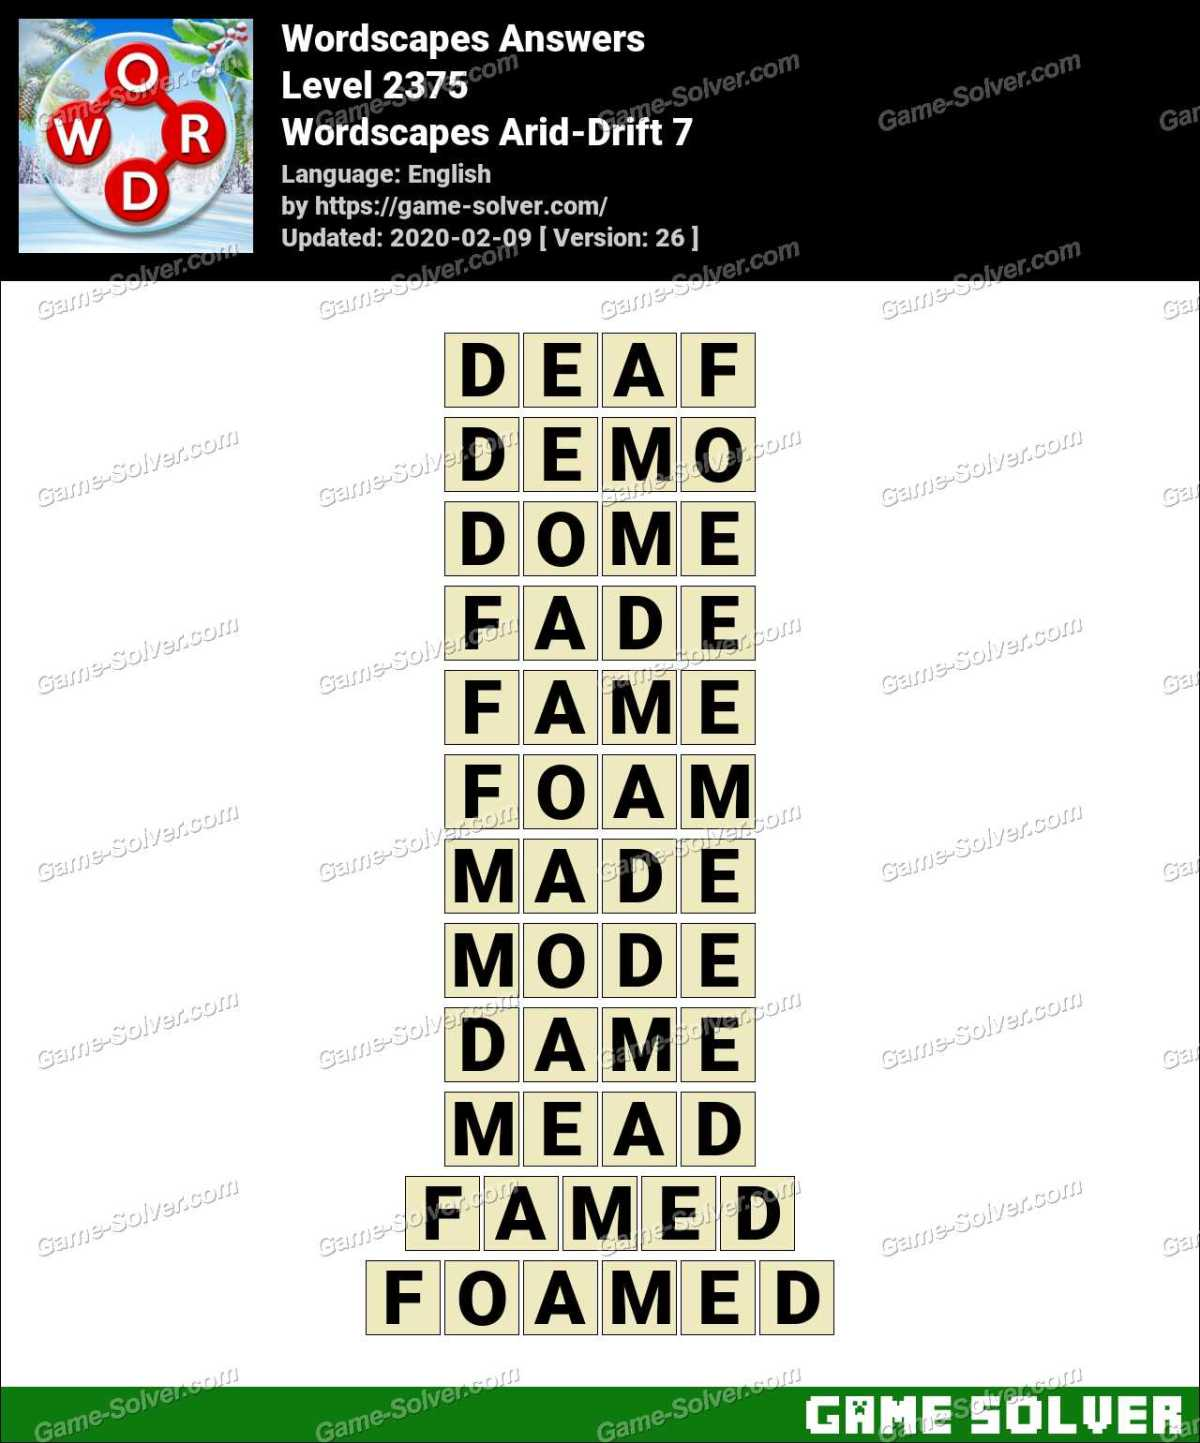 Wordscapes Arid-Drift 7 Answers